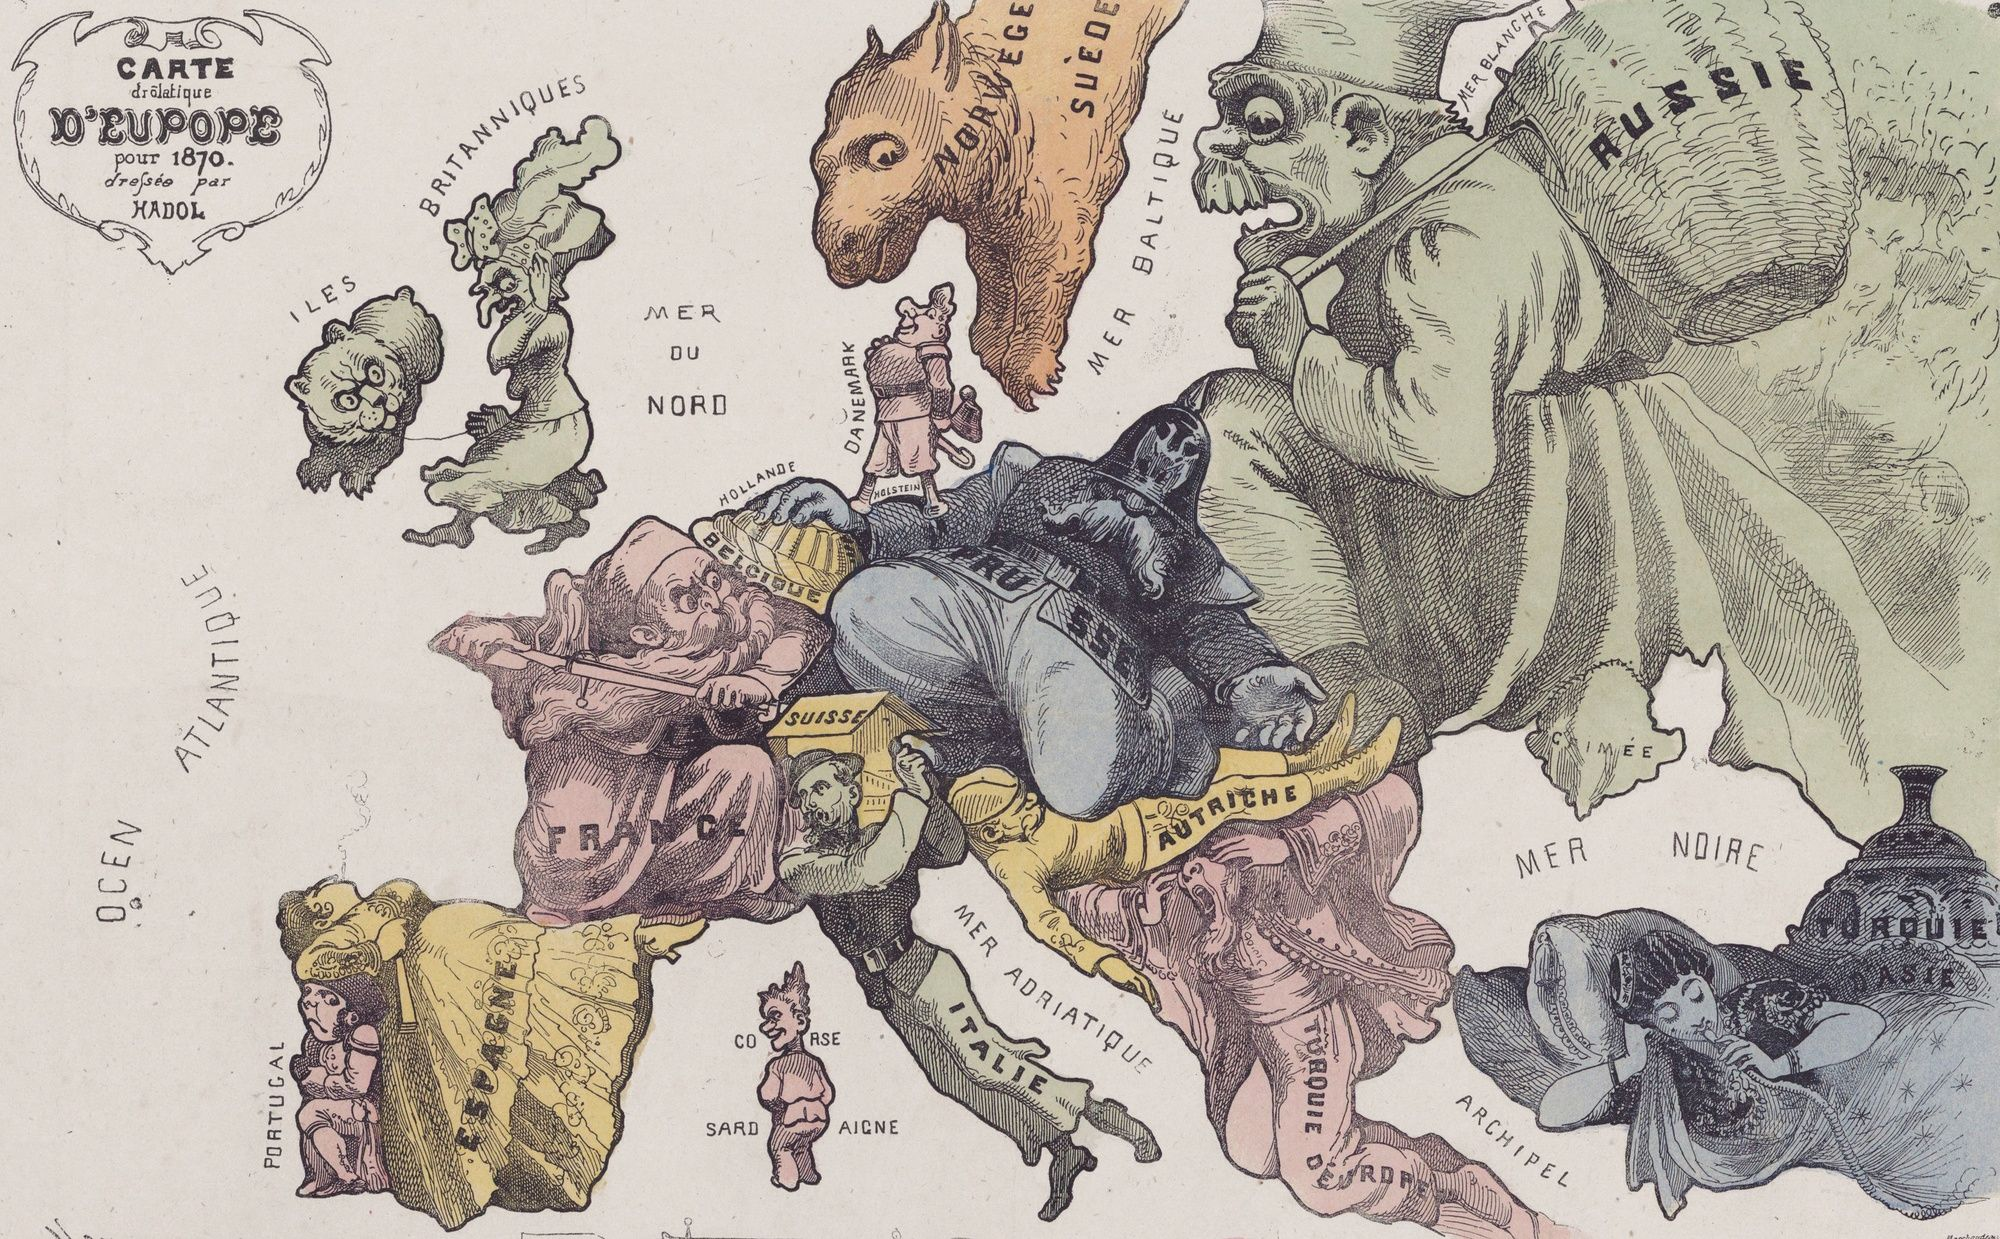 1870, Carte drôlatique d'Europe